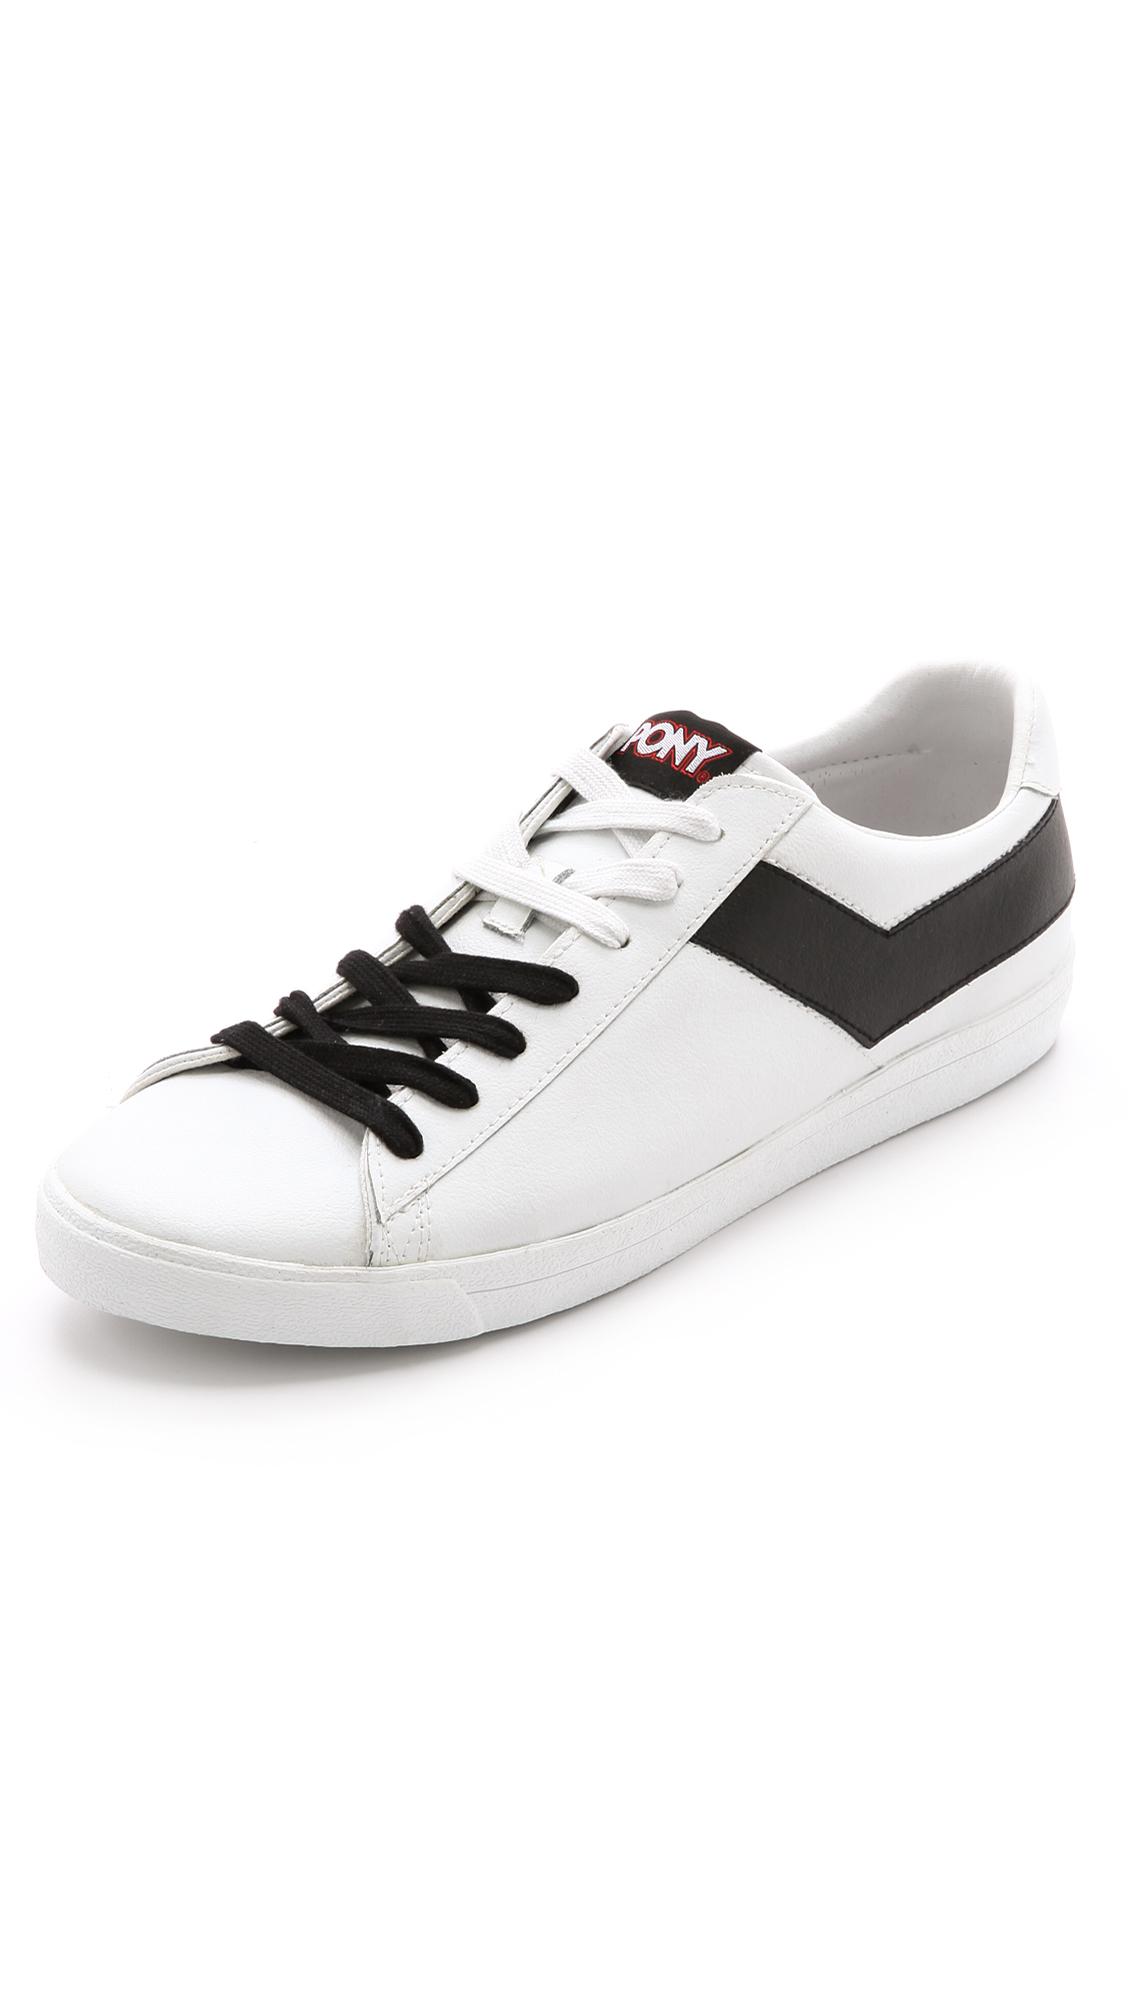 polo ralph lauren shoes romanian translator device